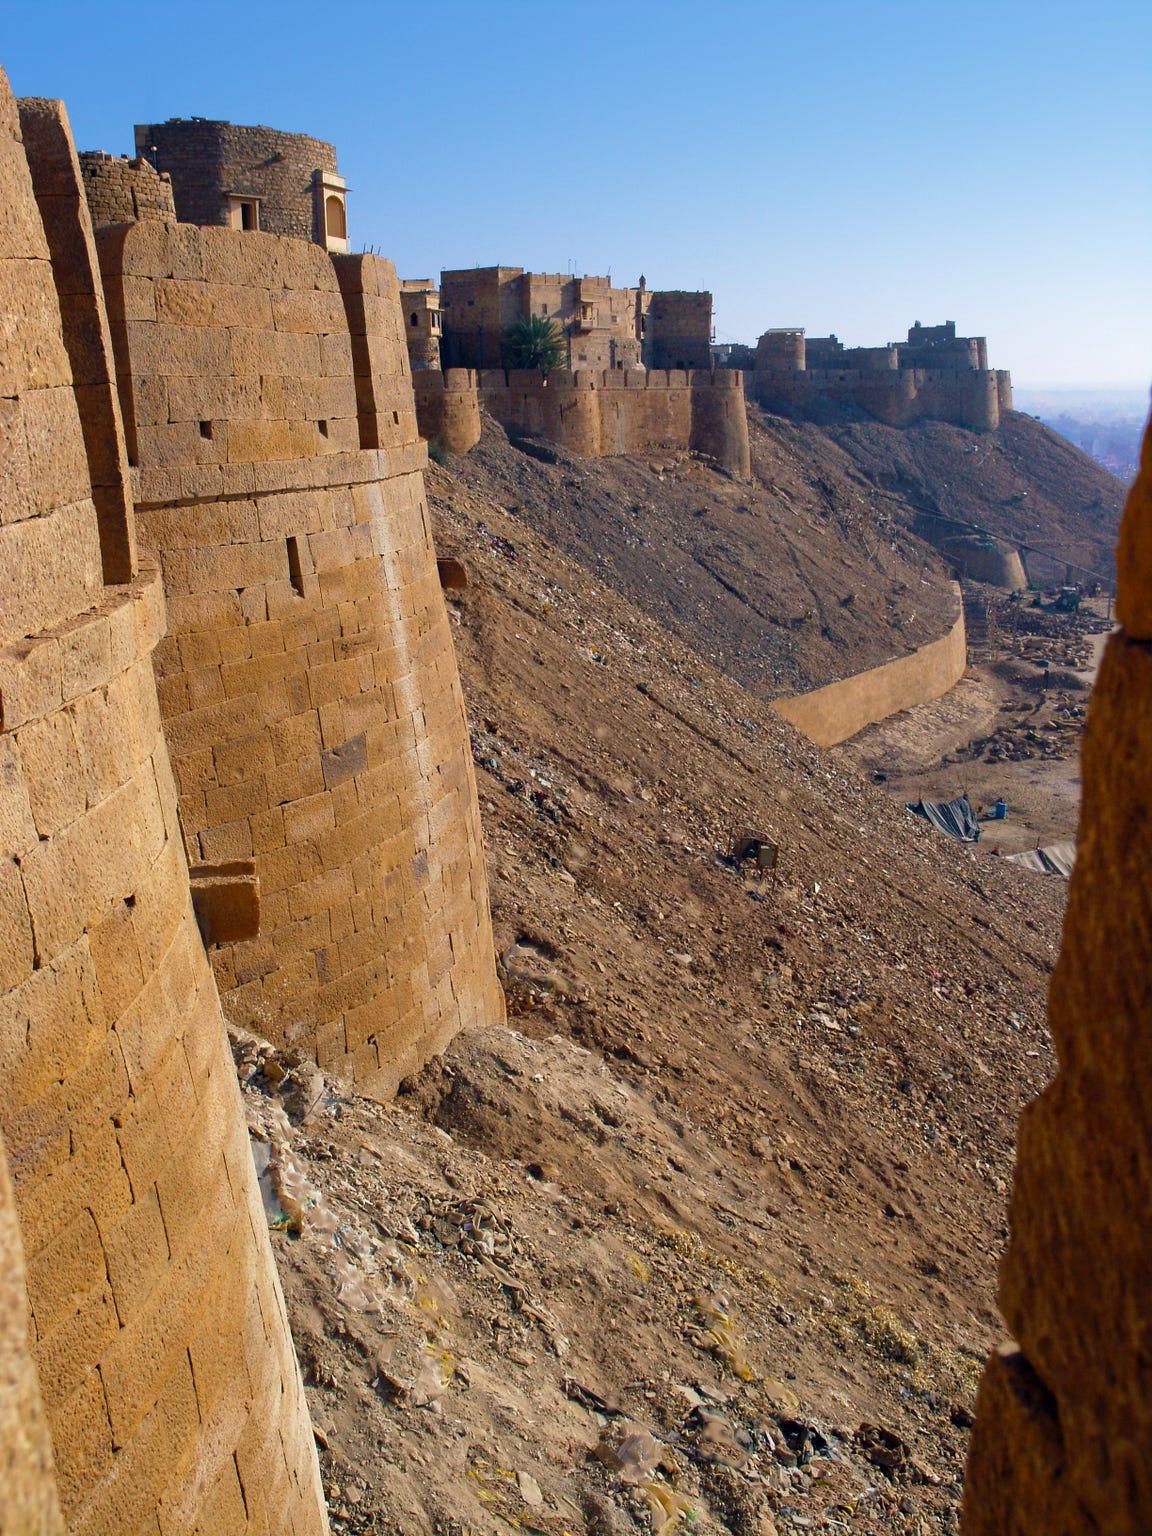 Walls of ancient city of Jaisalmer